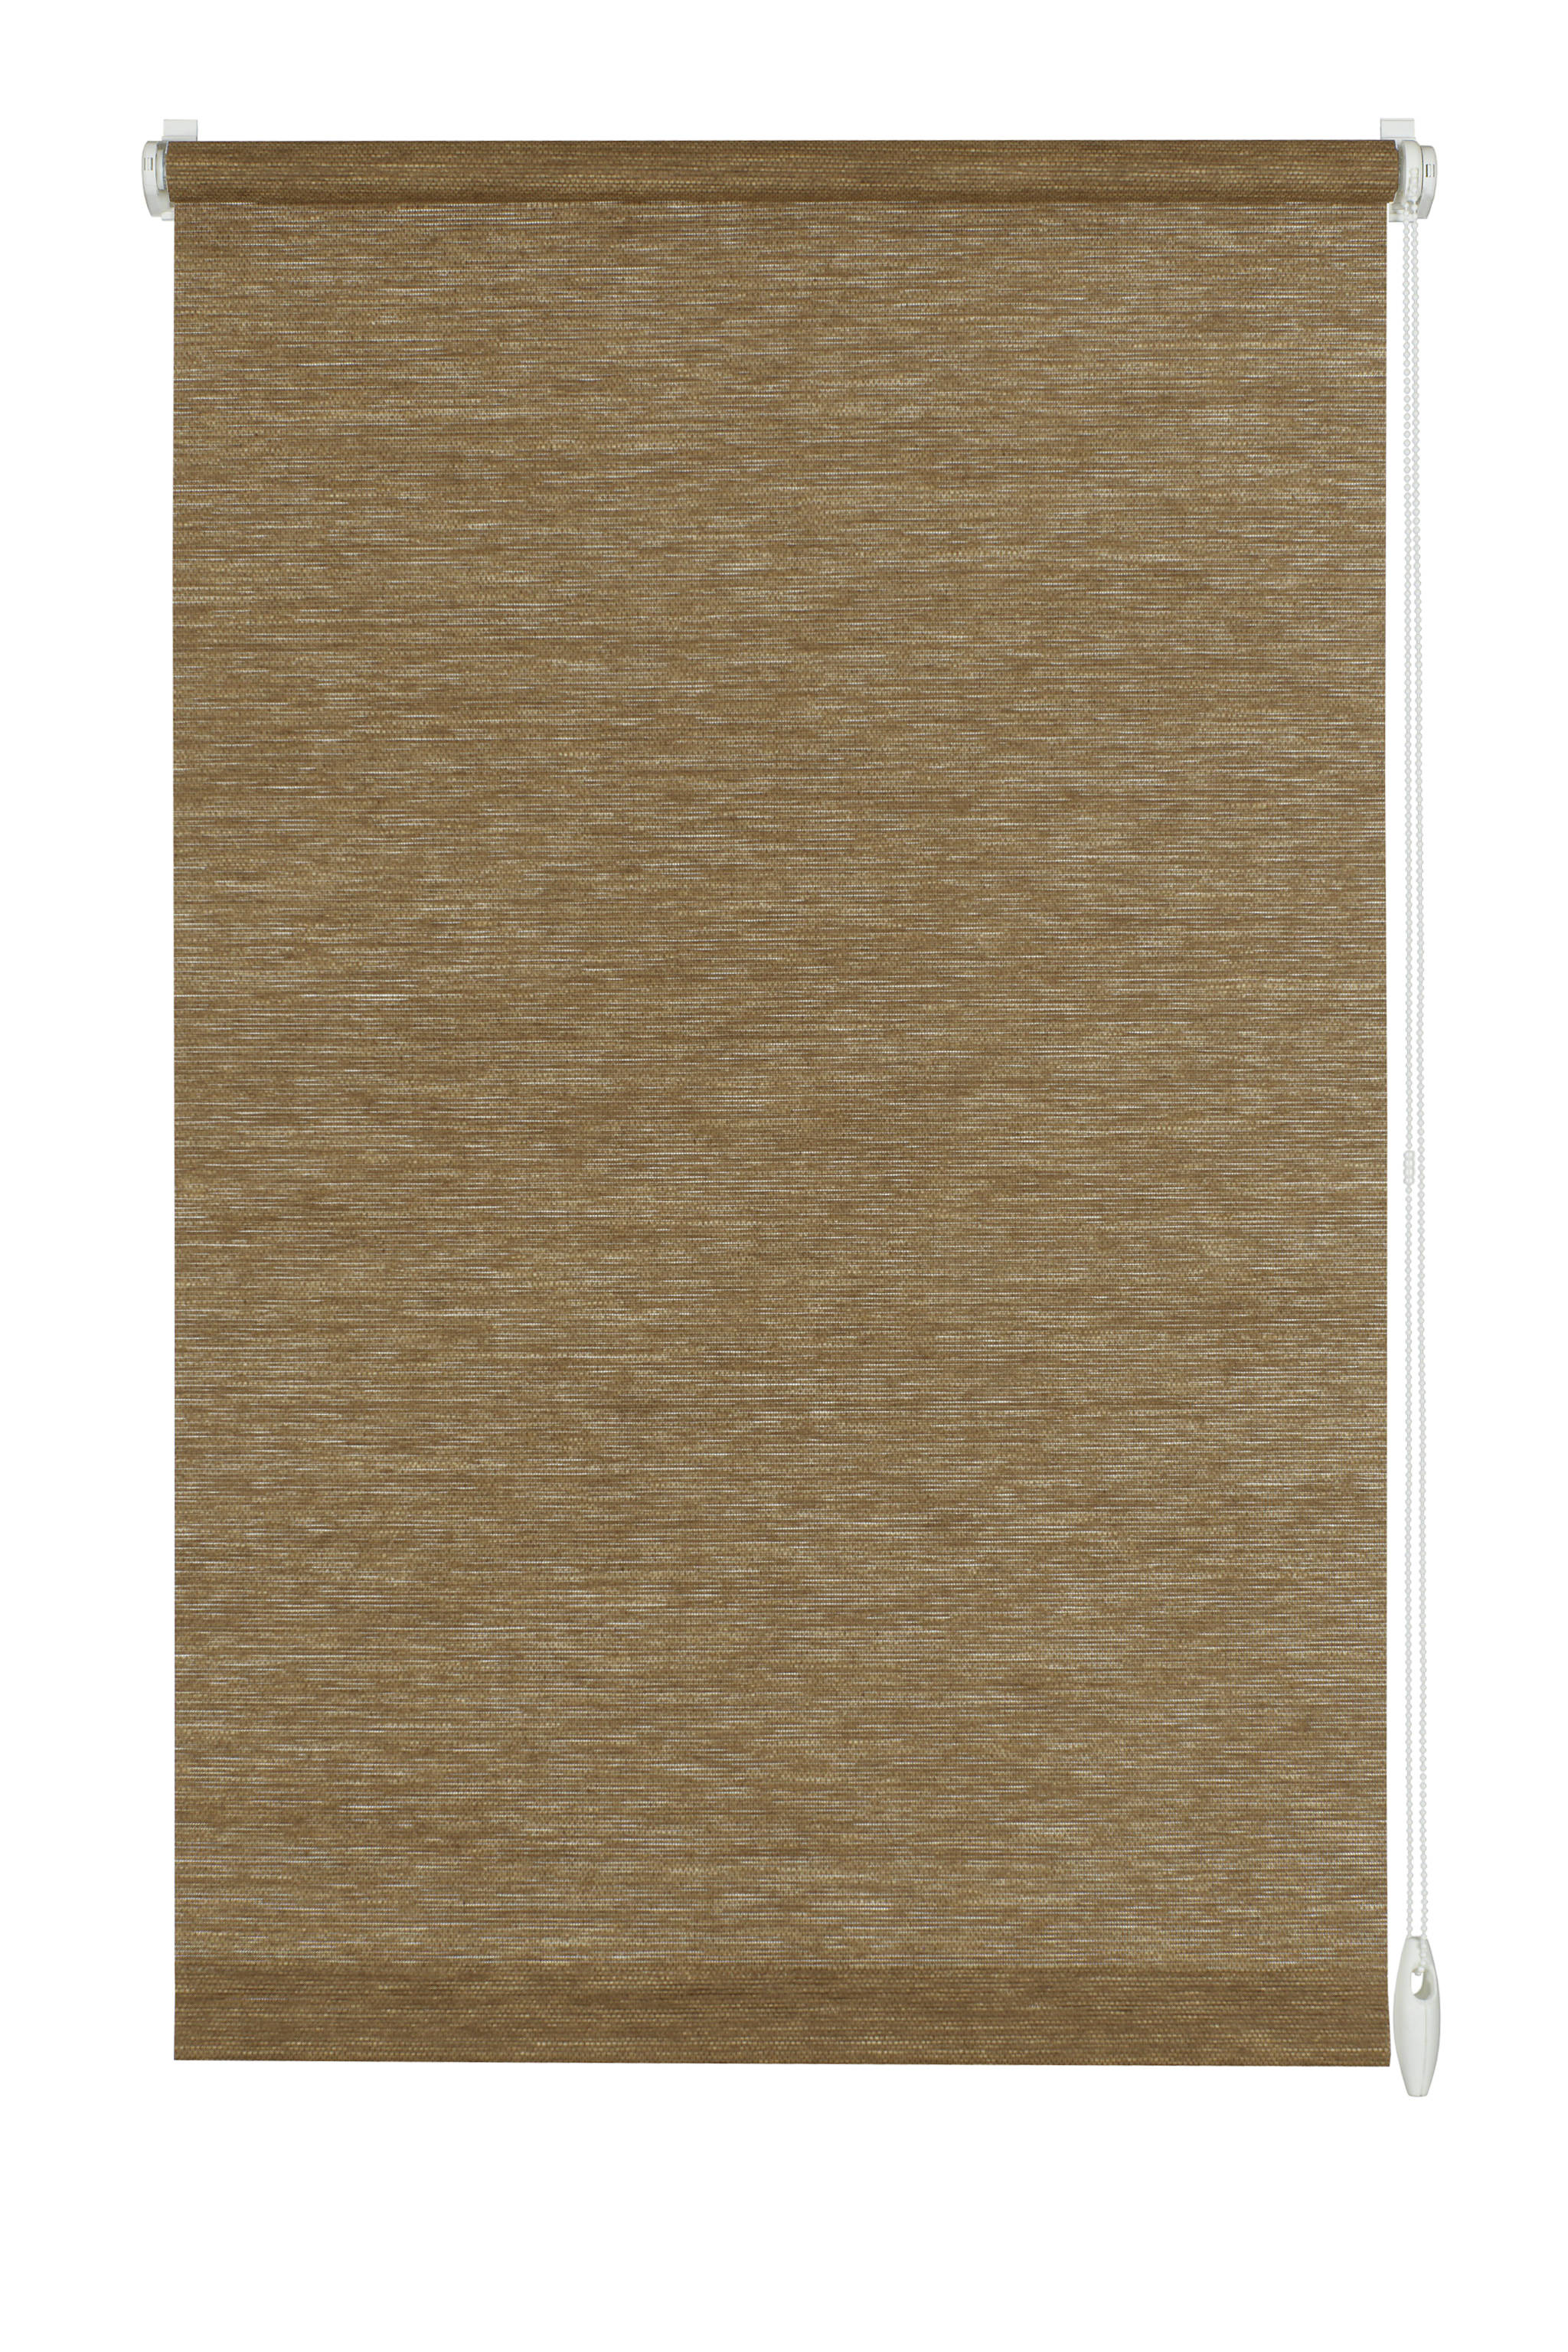 easyfix rollo nougat 120 x 150 cm 30710. Black Bedroom Furniture Sets. Home Design Ideas